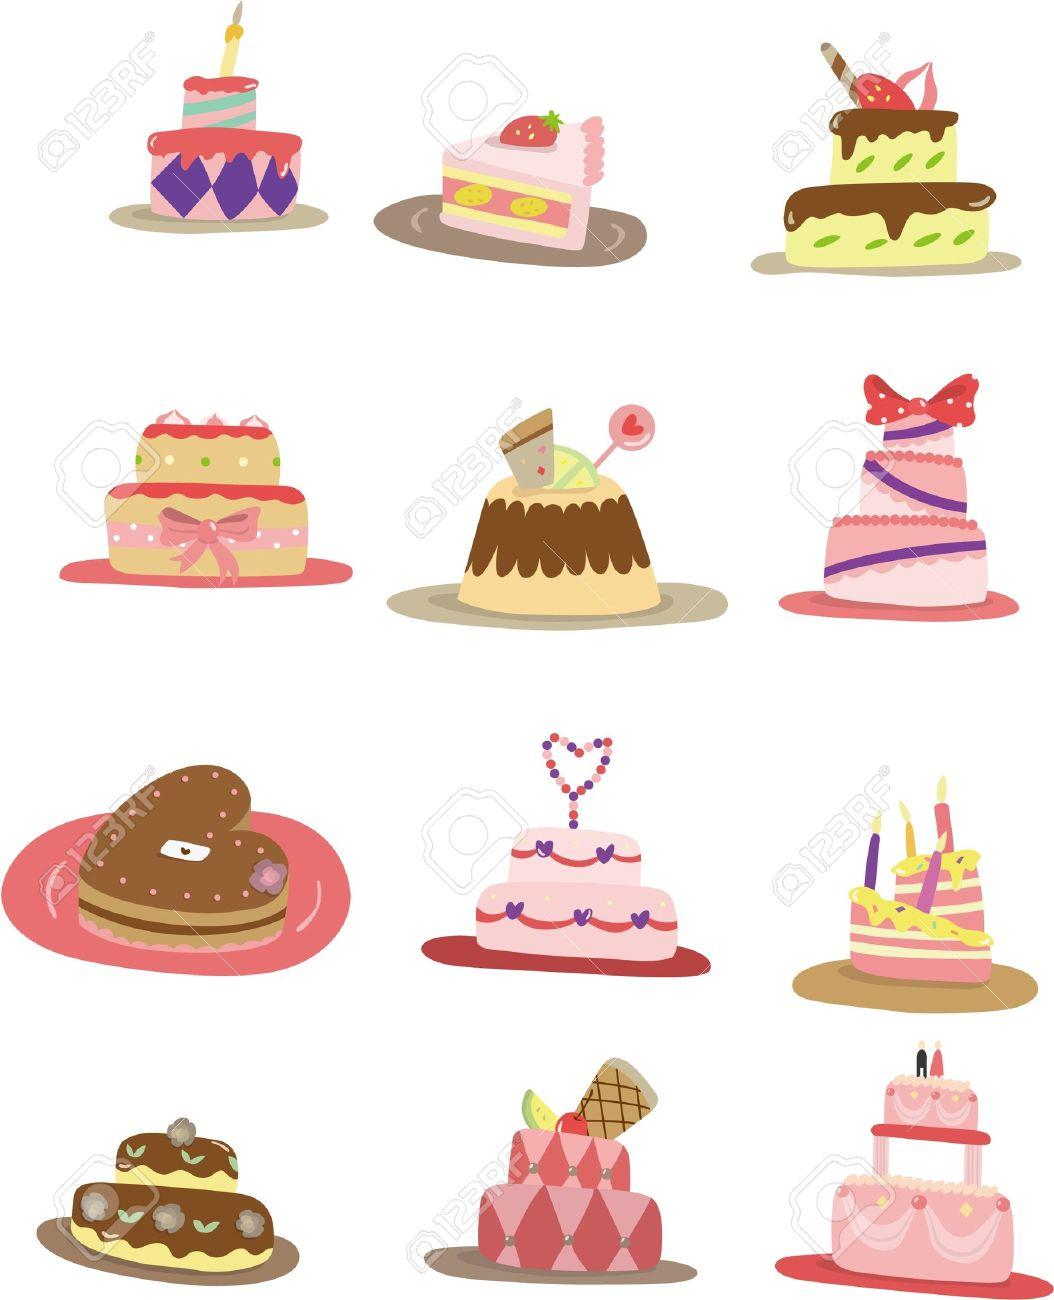 cartoon cake icon - 8613952